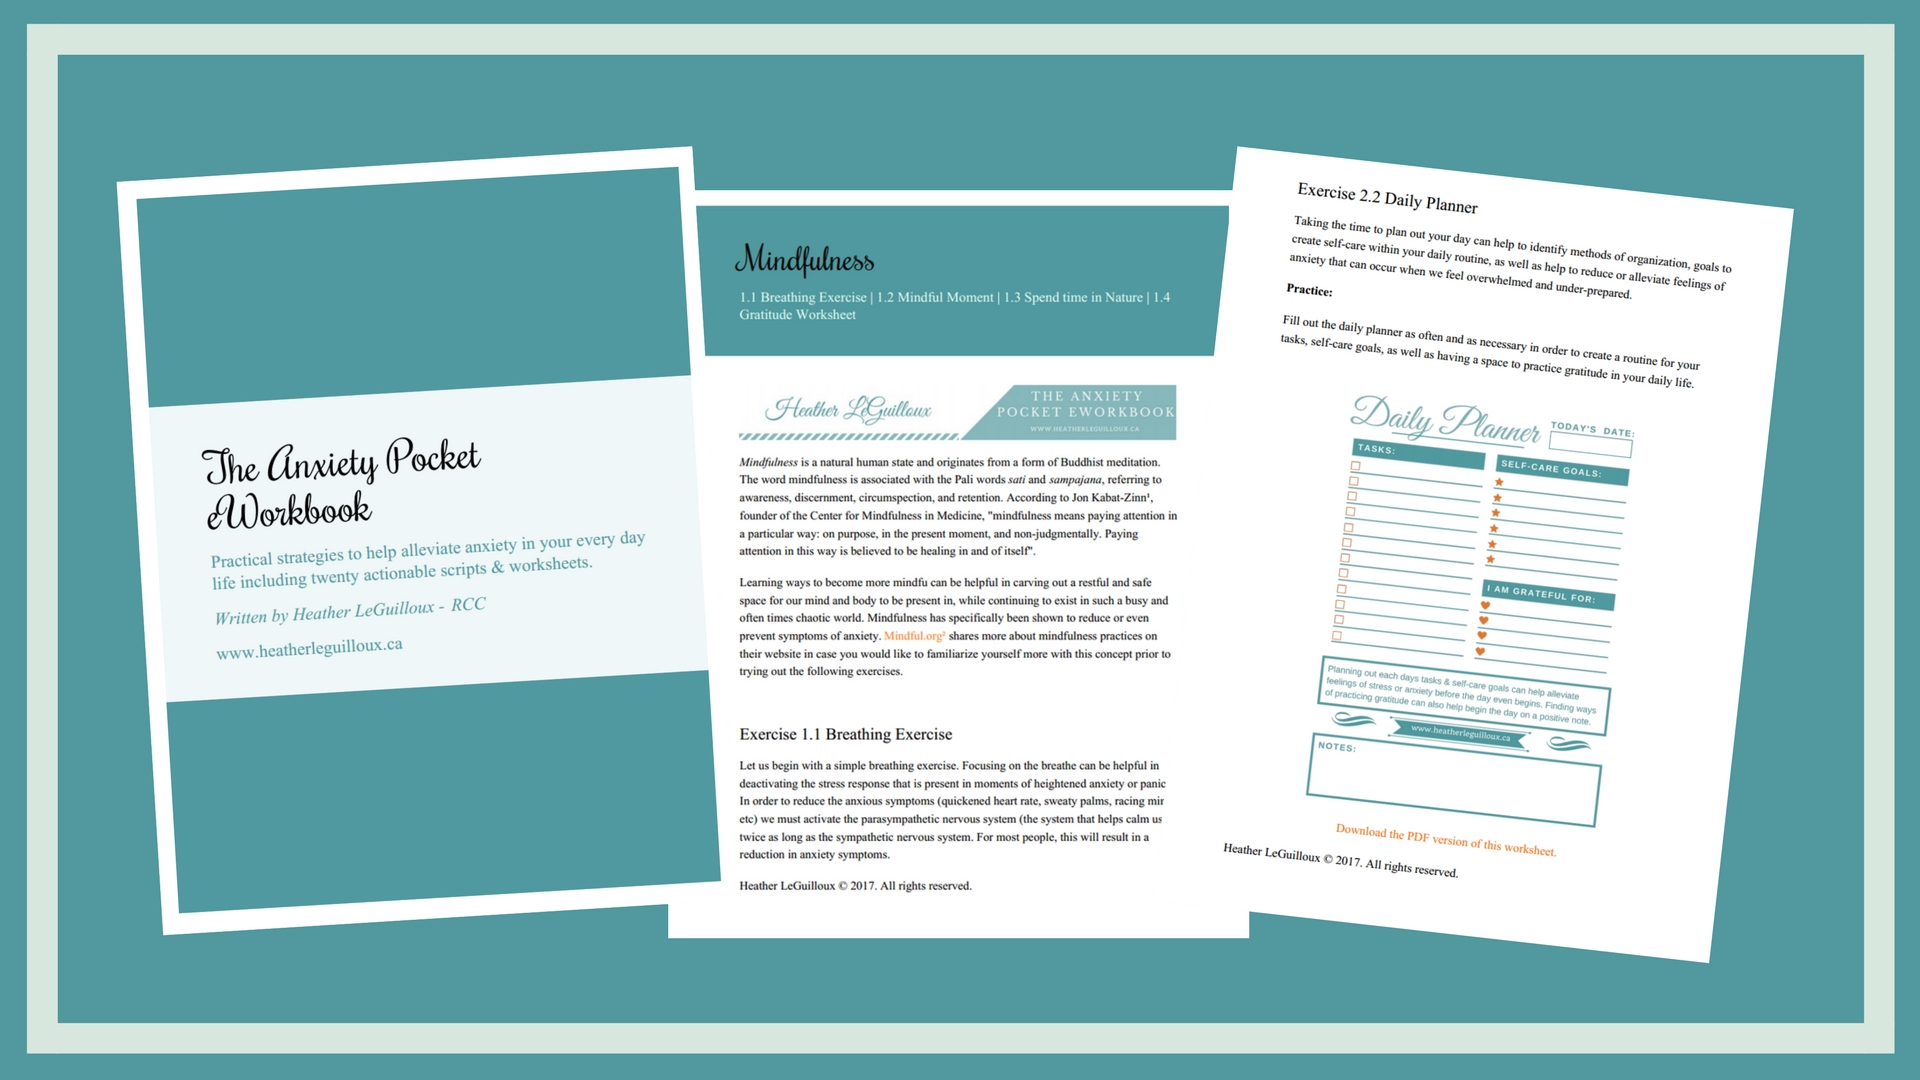 The Anxiety Pocket Eworkbook